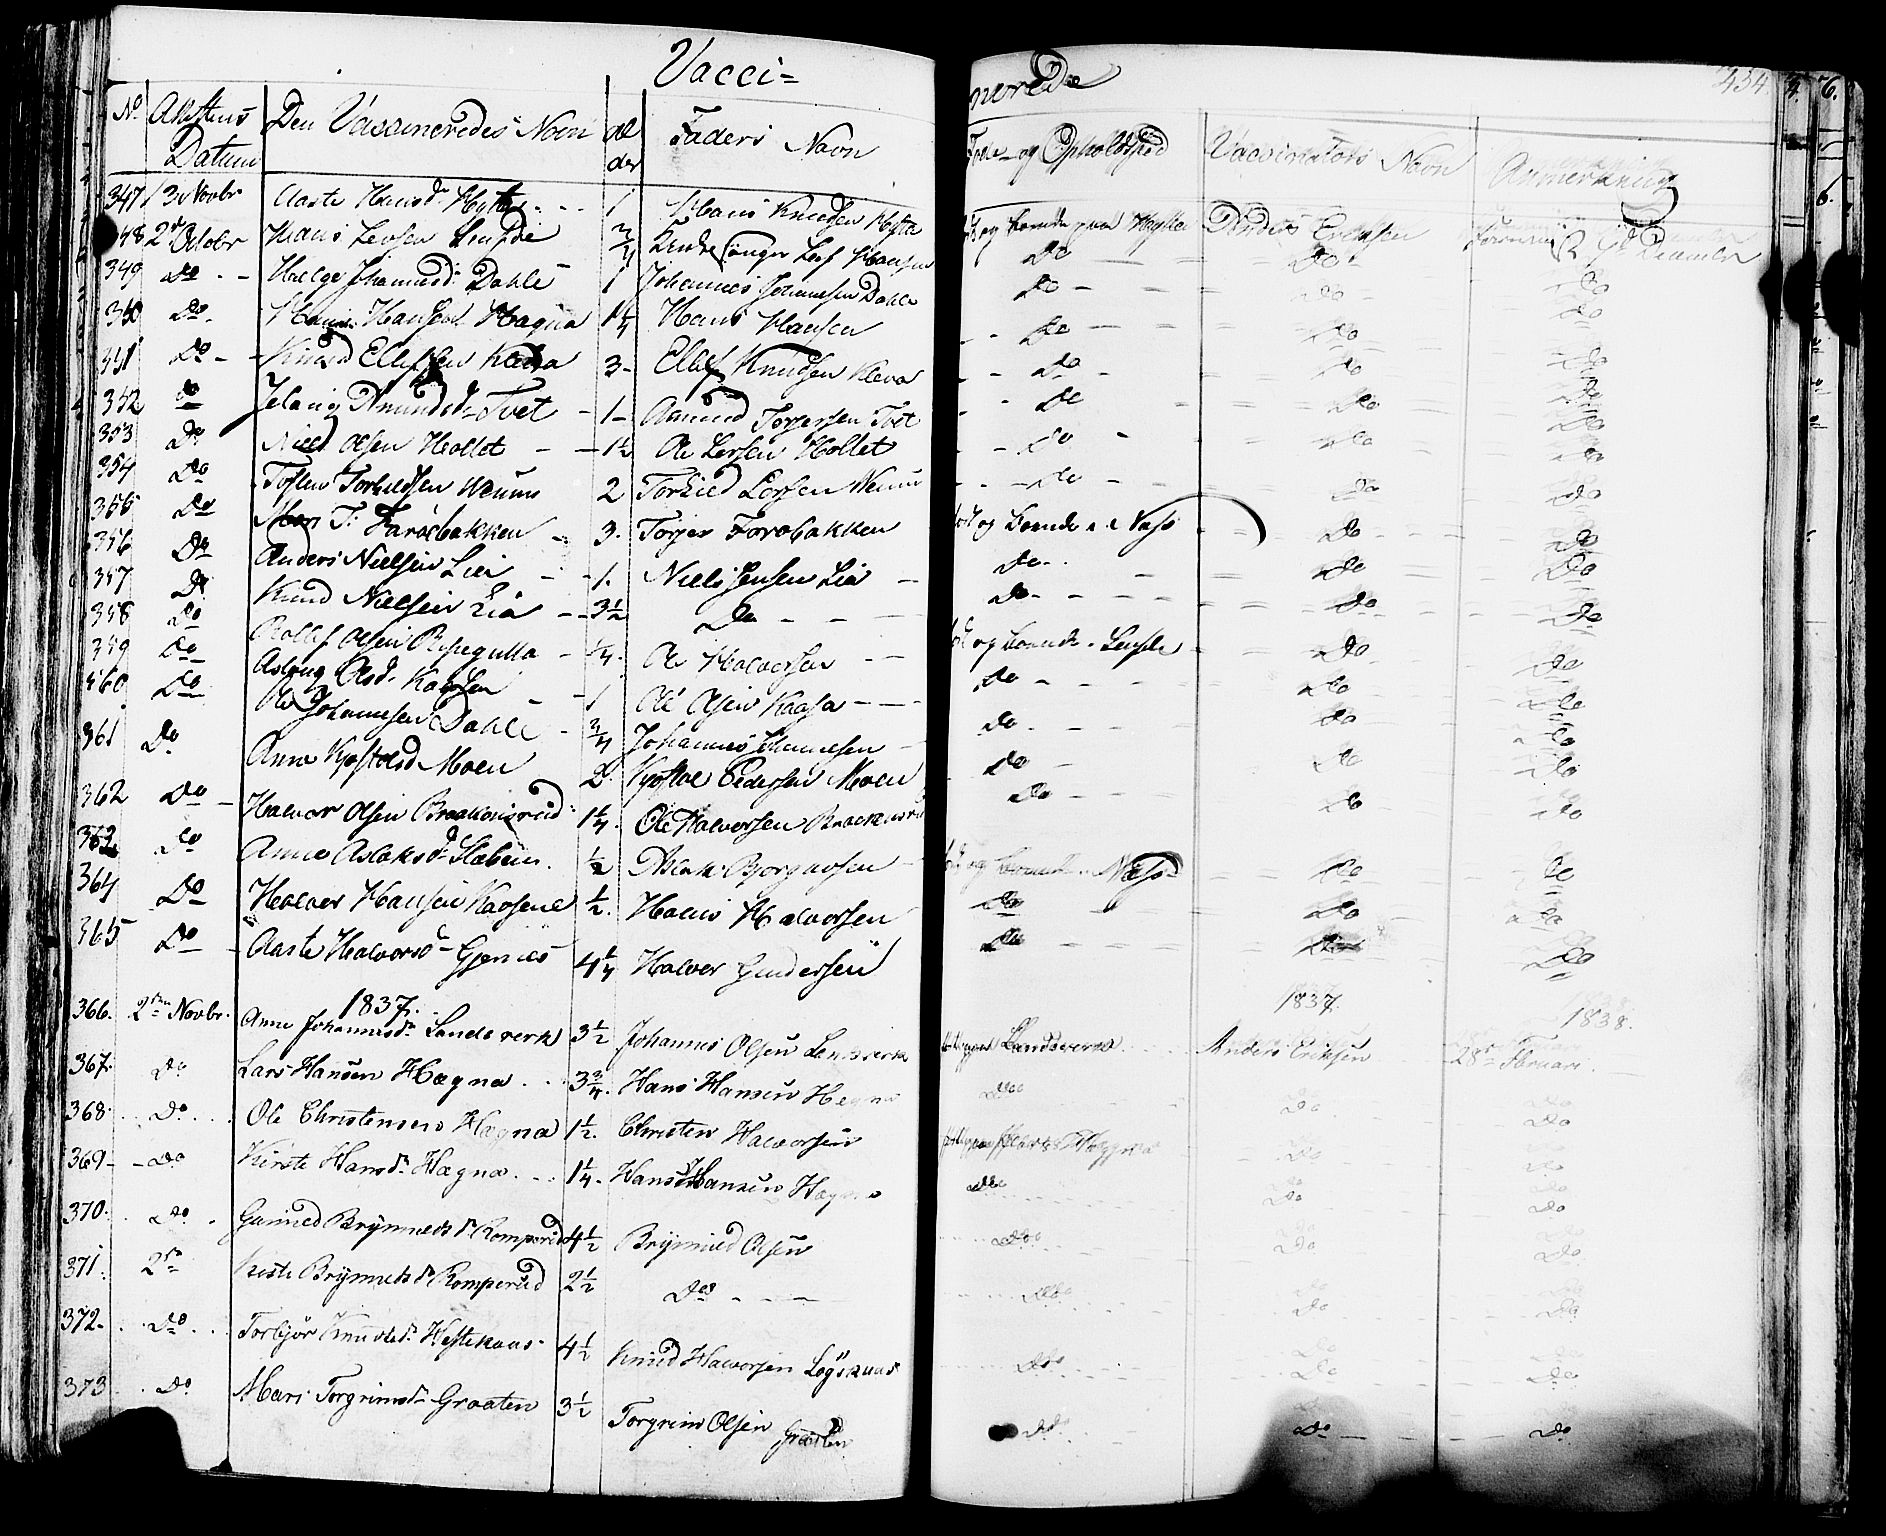 SAKO, Sauherad kirkebøker, F/Fa/L0006: Ministerialbok nr. I 6, 1827-1850, s. 434